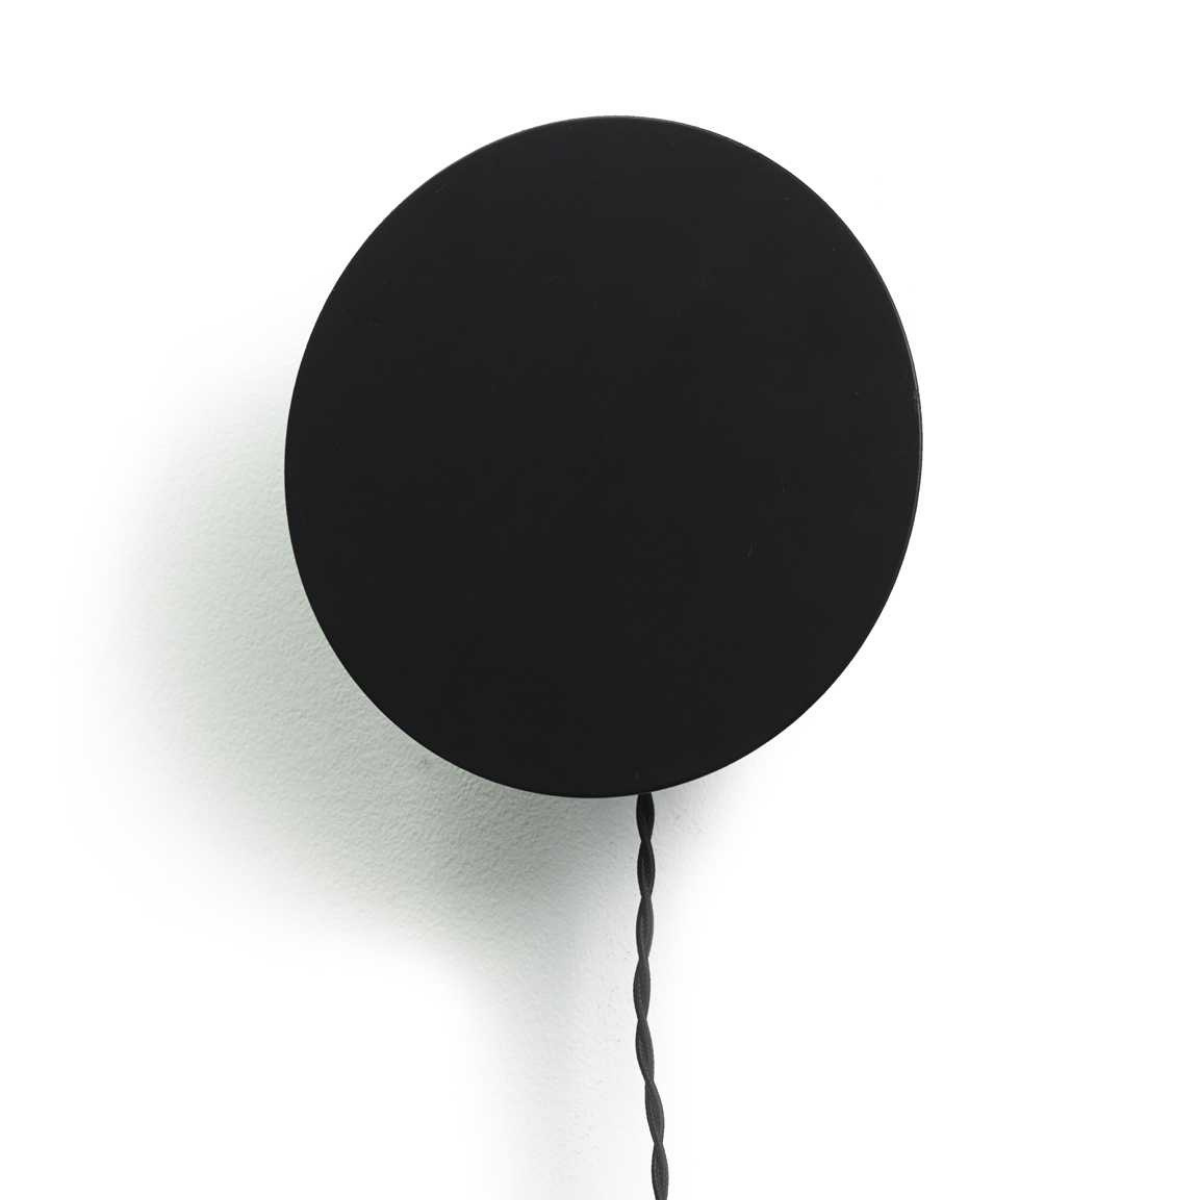 Lampa ścienna Scudo Black Serax